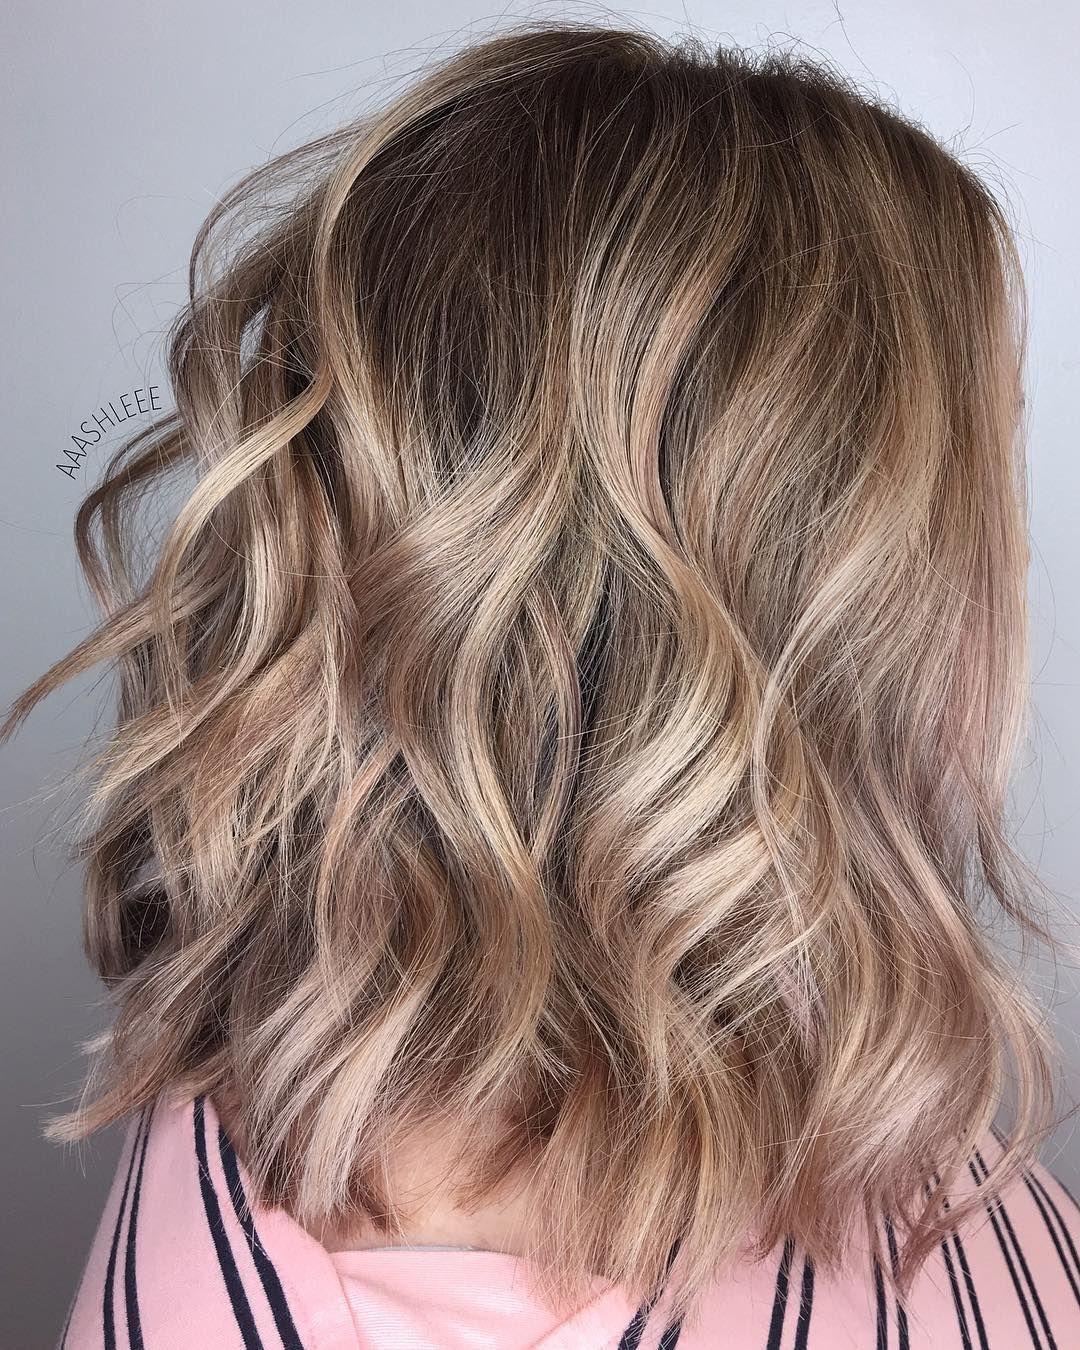 Hair Painting By Ashlee Aaashleee On Instagram Blush